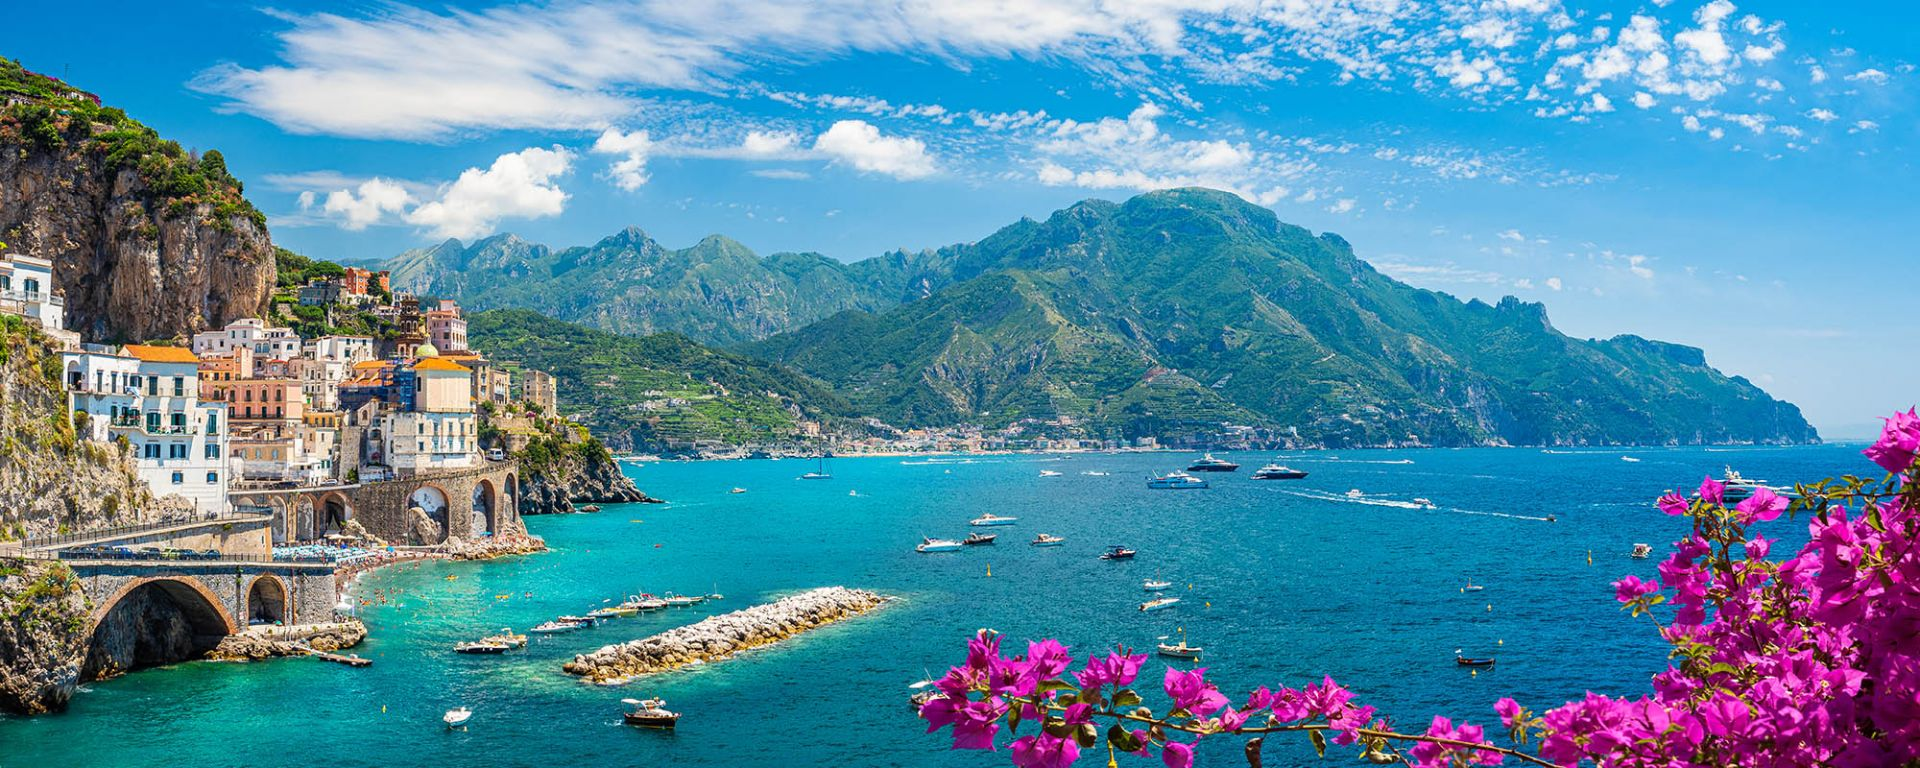 Amalfi Coast Walking Tour Header